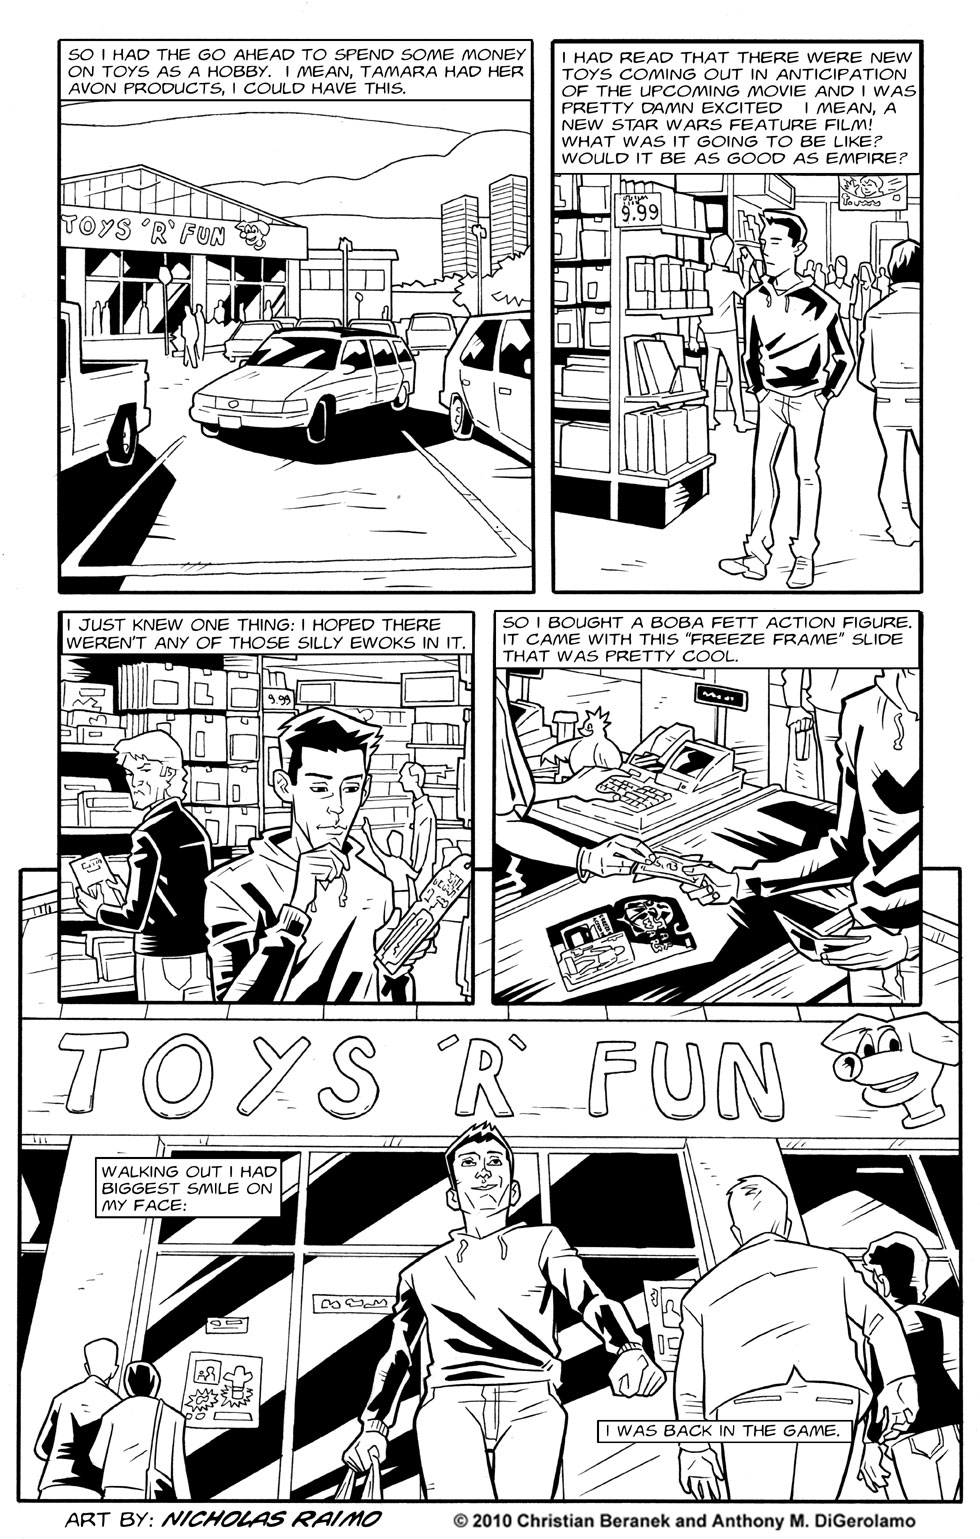 Dealers: The Boba Fett Purchase